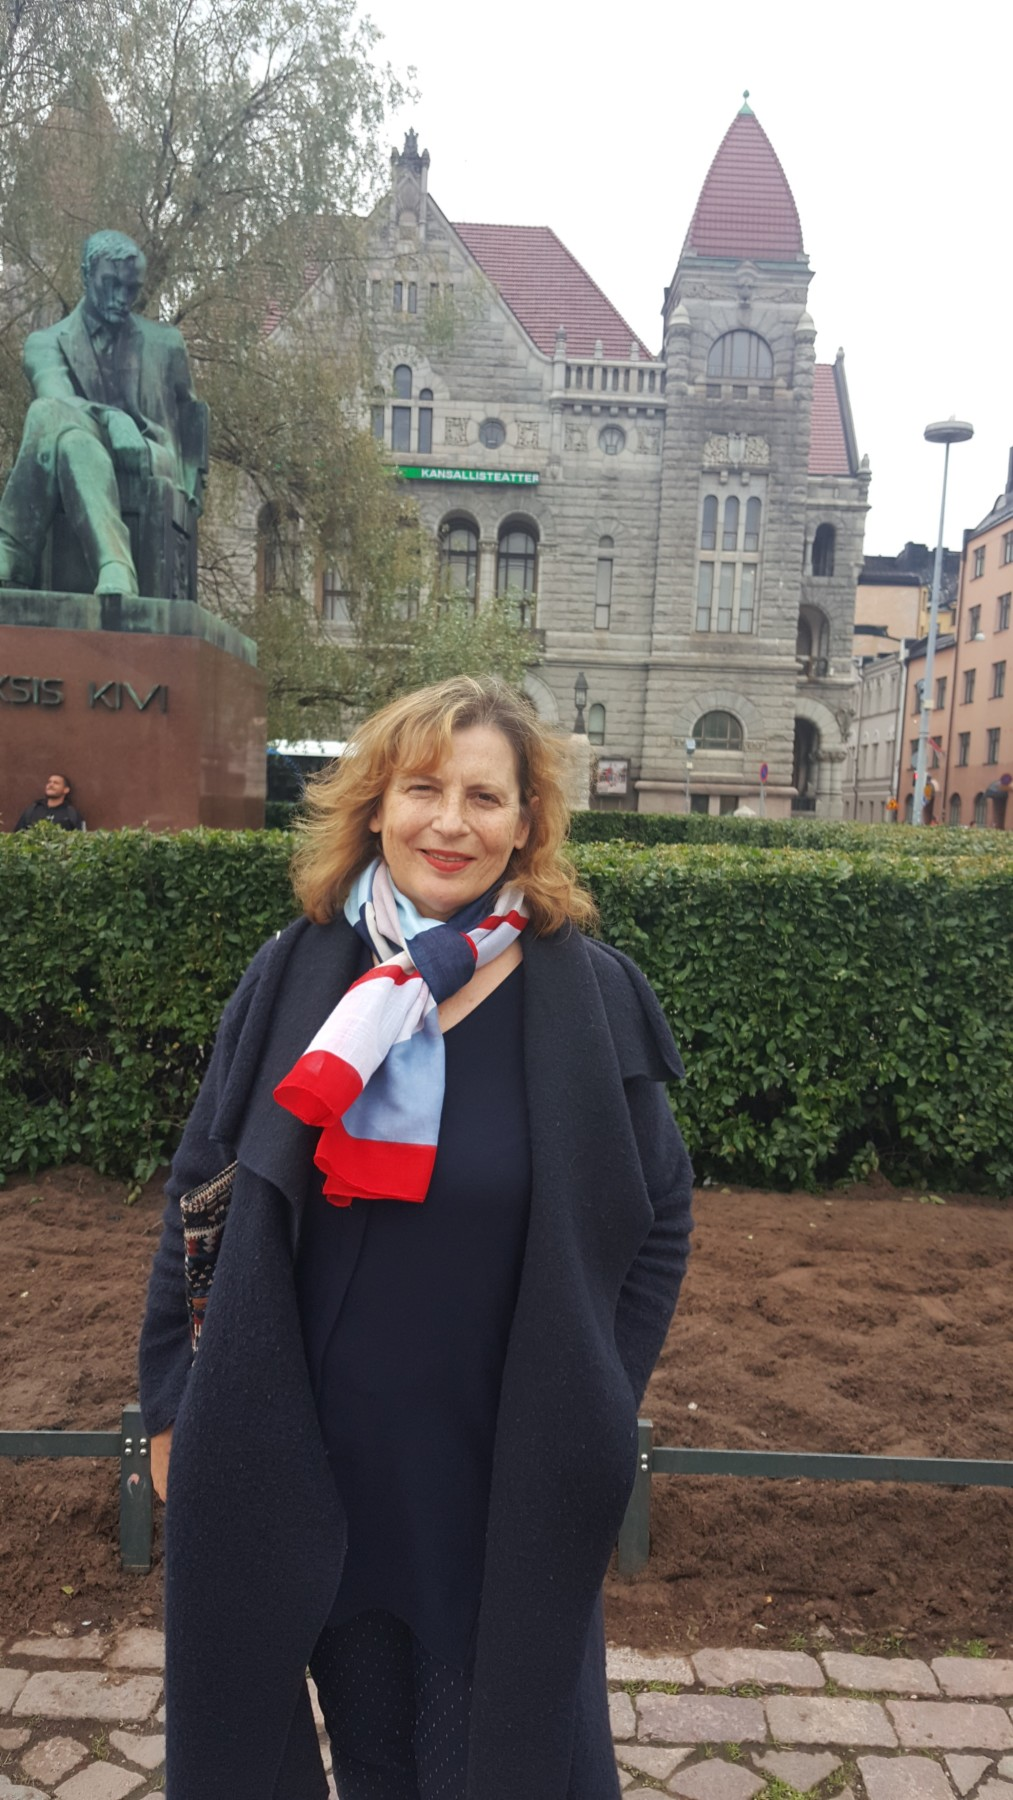 H Αναστασία Ζαμπανιώτου είναι Καθηγήτρια στο Τμήμα Χημικών Μηχανικών της Πολυτεχνικής Σχολής του ΑΠΘ